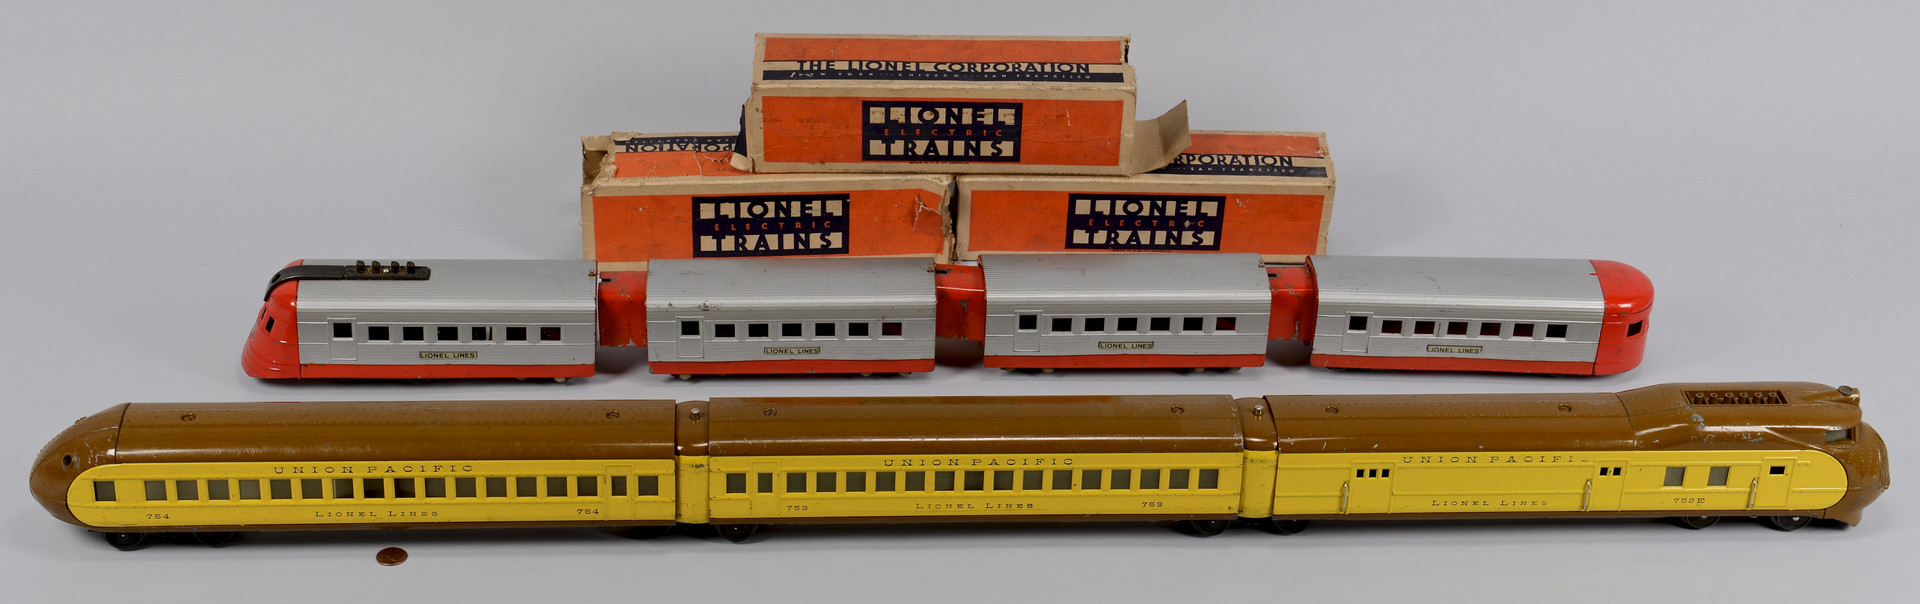 Lot 468: Lionel Union Pacific & Streamline Diesel Trains